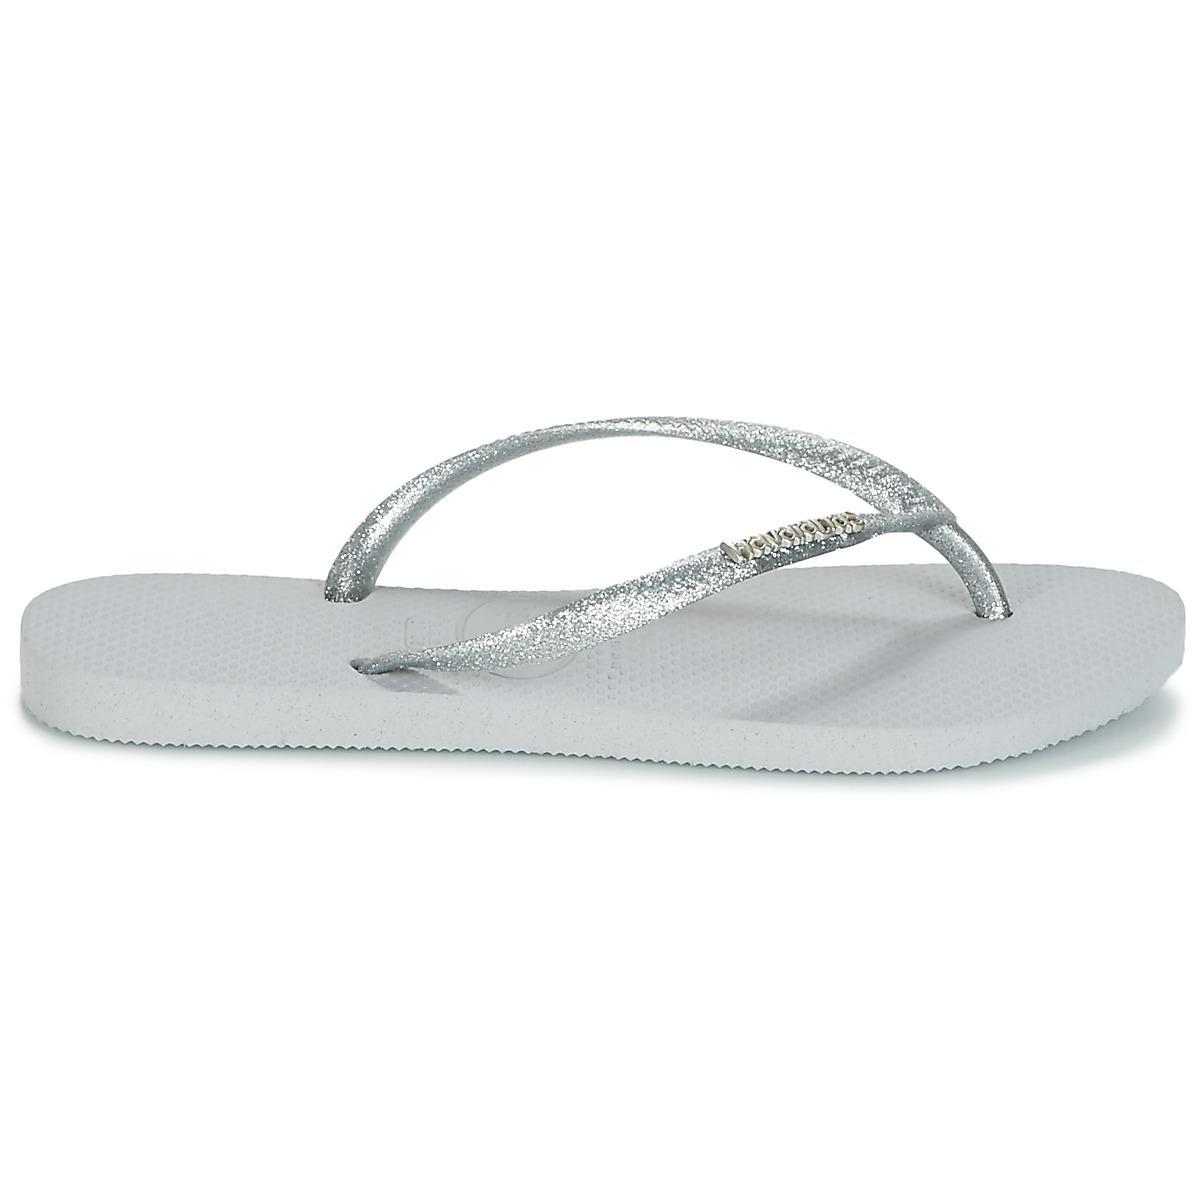 1f0f90f0b5f9b4 Havaianas Slim Logo Metallic Flip Flops   Sandals (shoes) in Gray ...